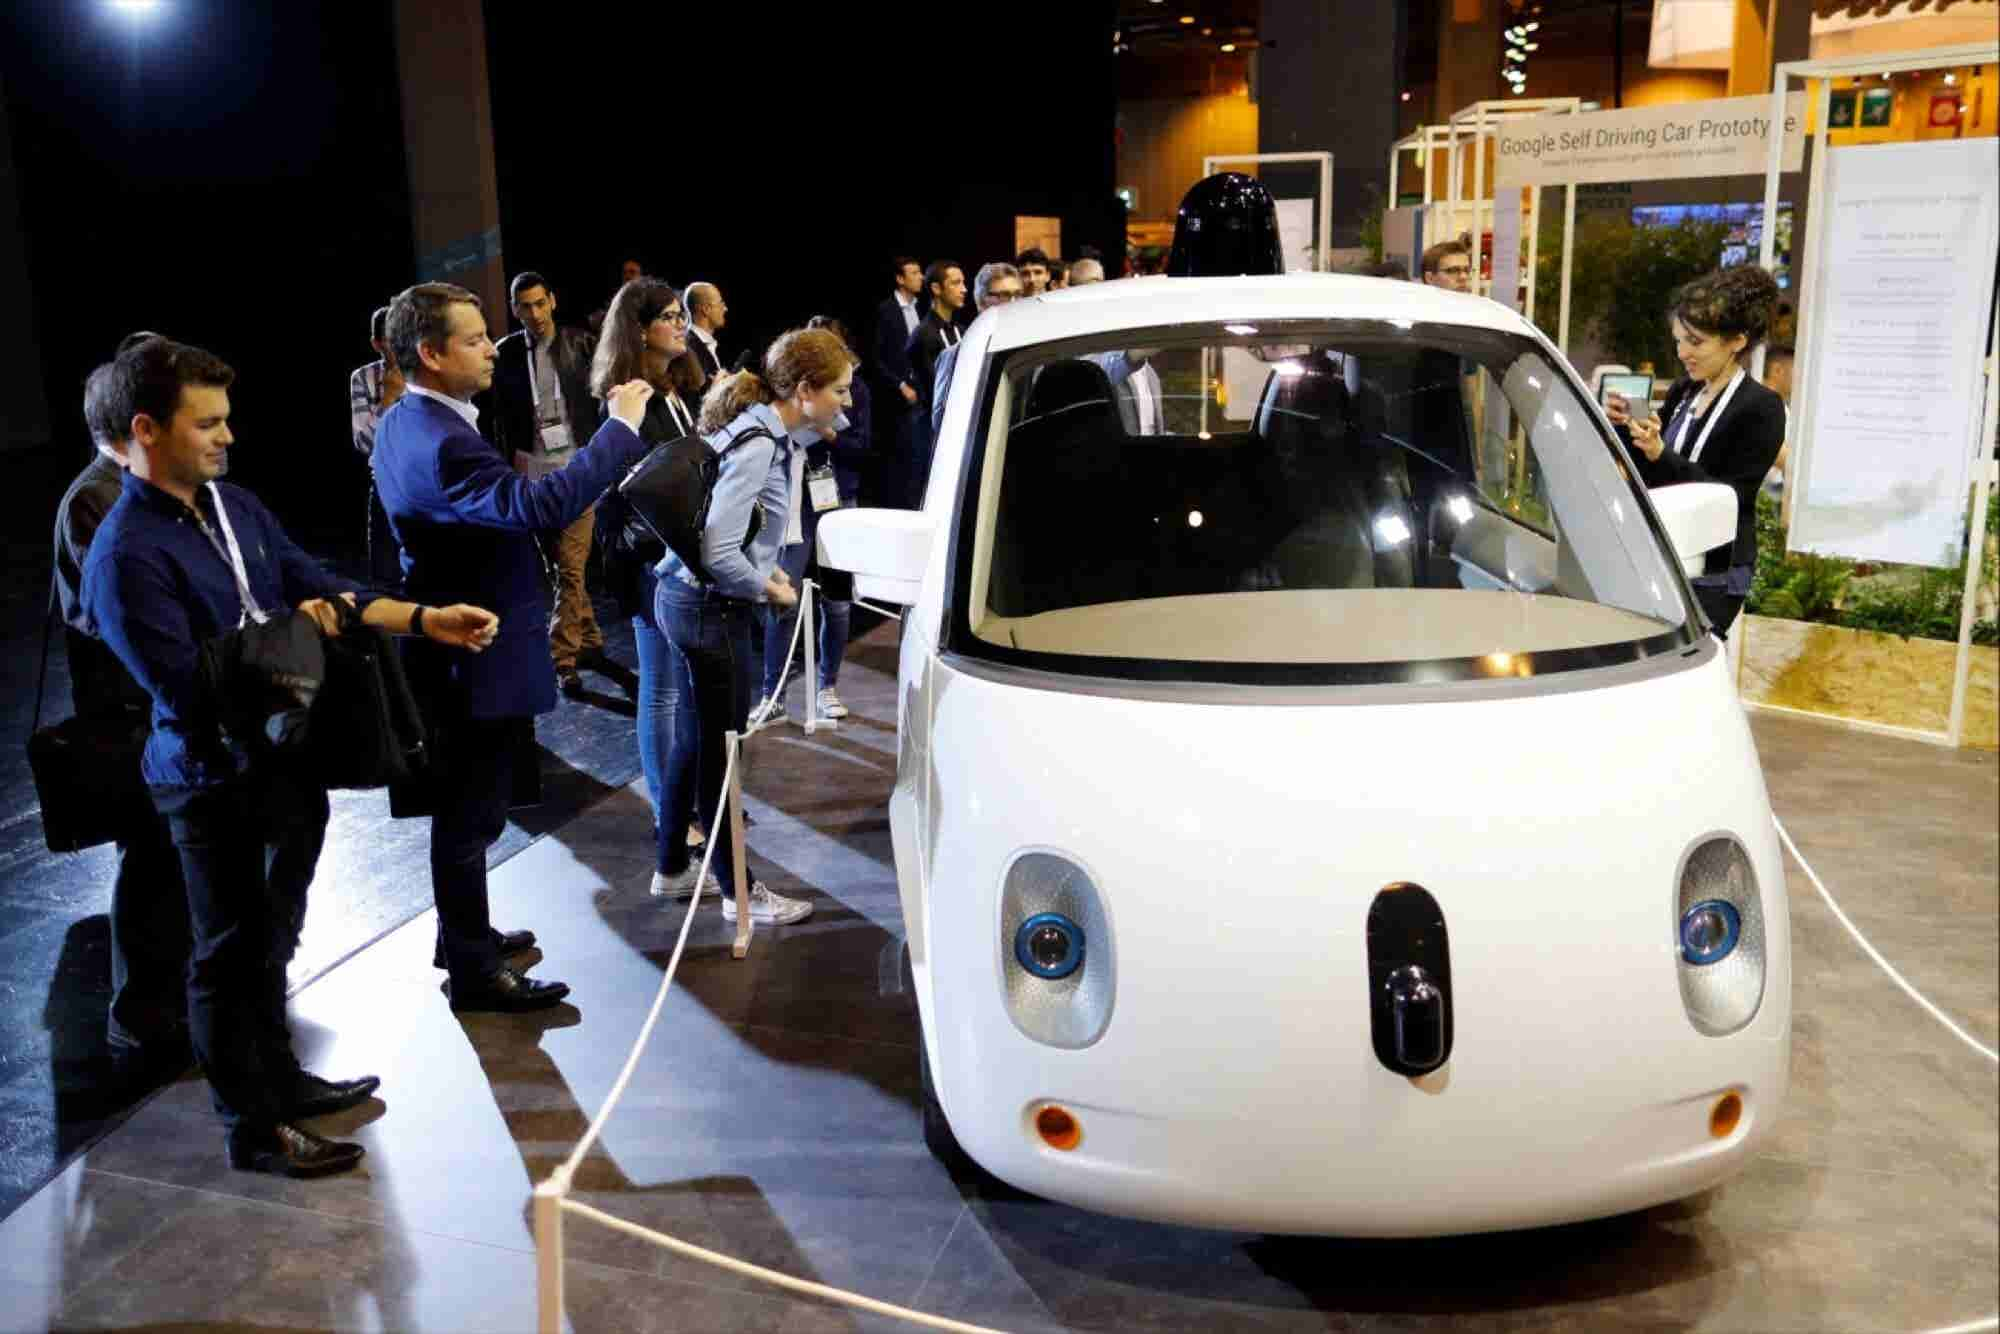 Google Makes Progress on Self-Driving Cars as it Hits the 2 Million Mile Mark